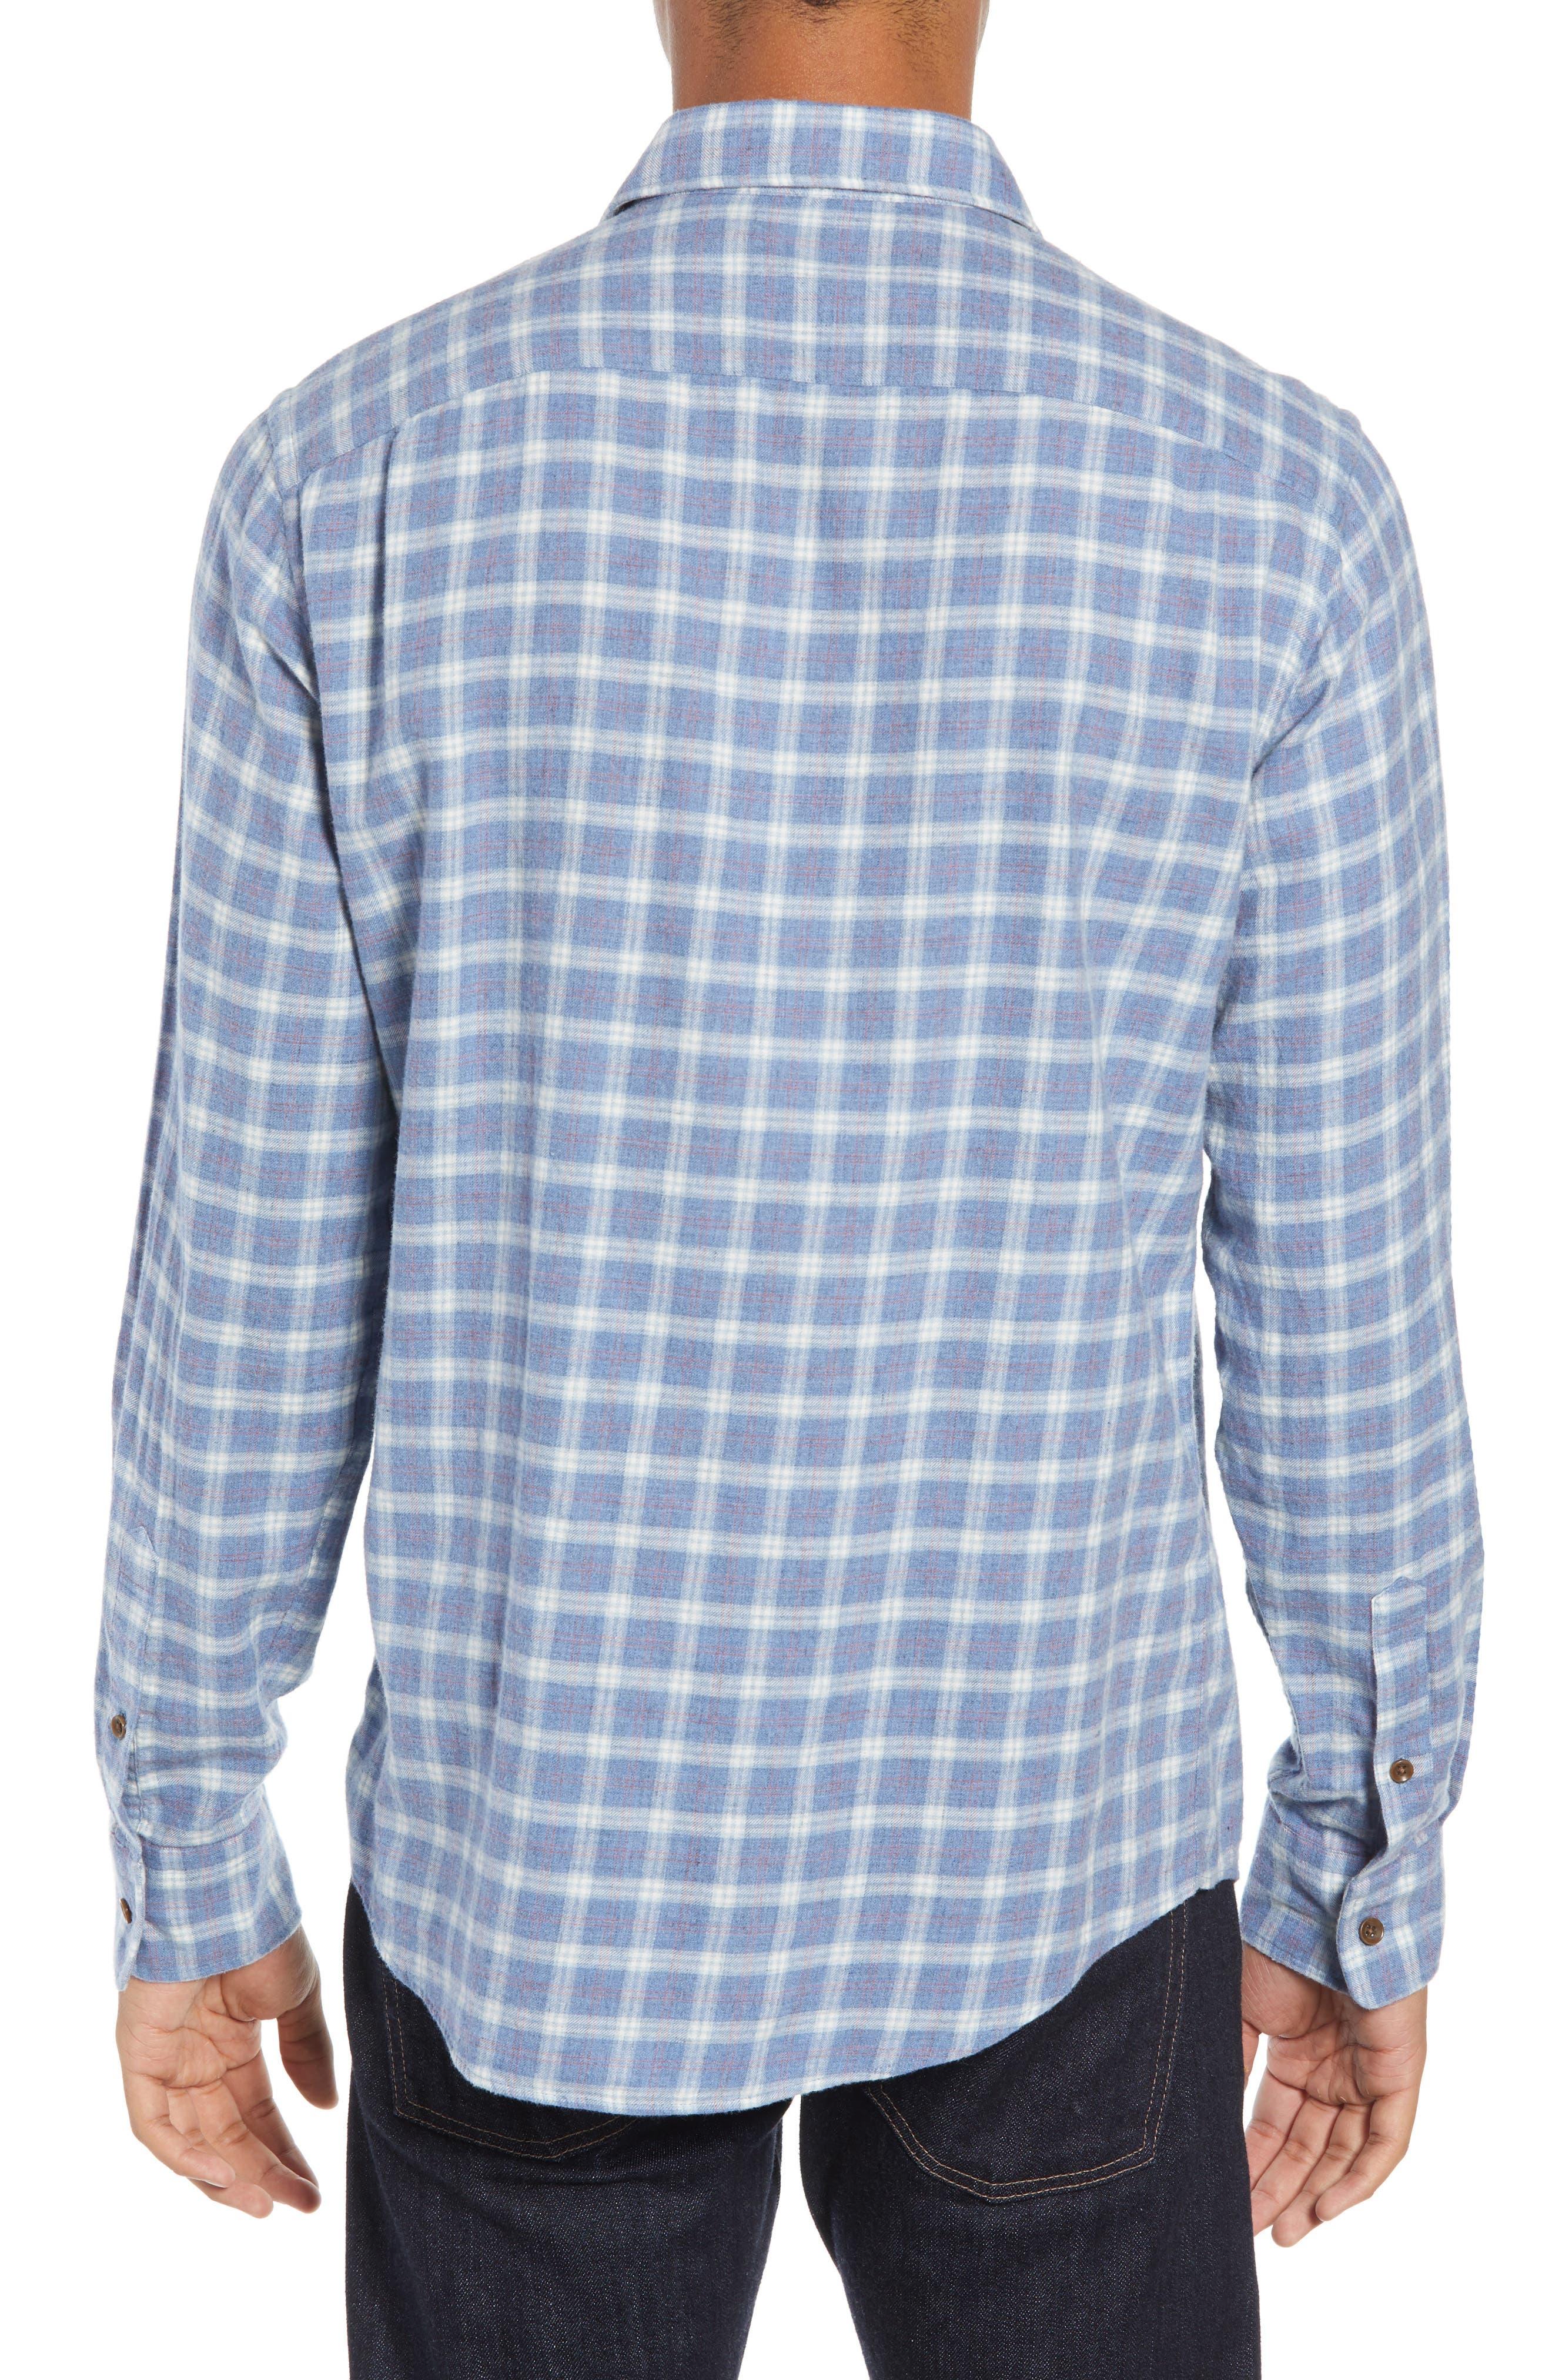 Ventura Oxford Sport Shirt,                             Alternate thumbnail 3, color,                             HEATHER BLUE CHECK